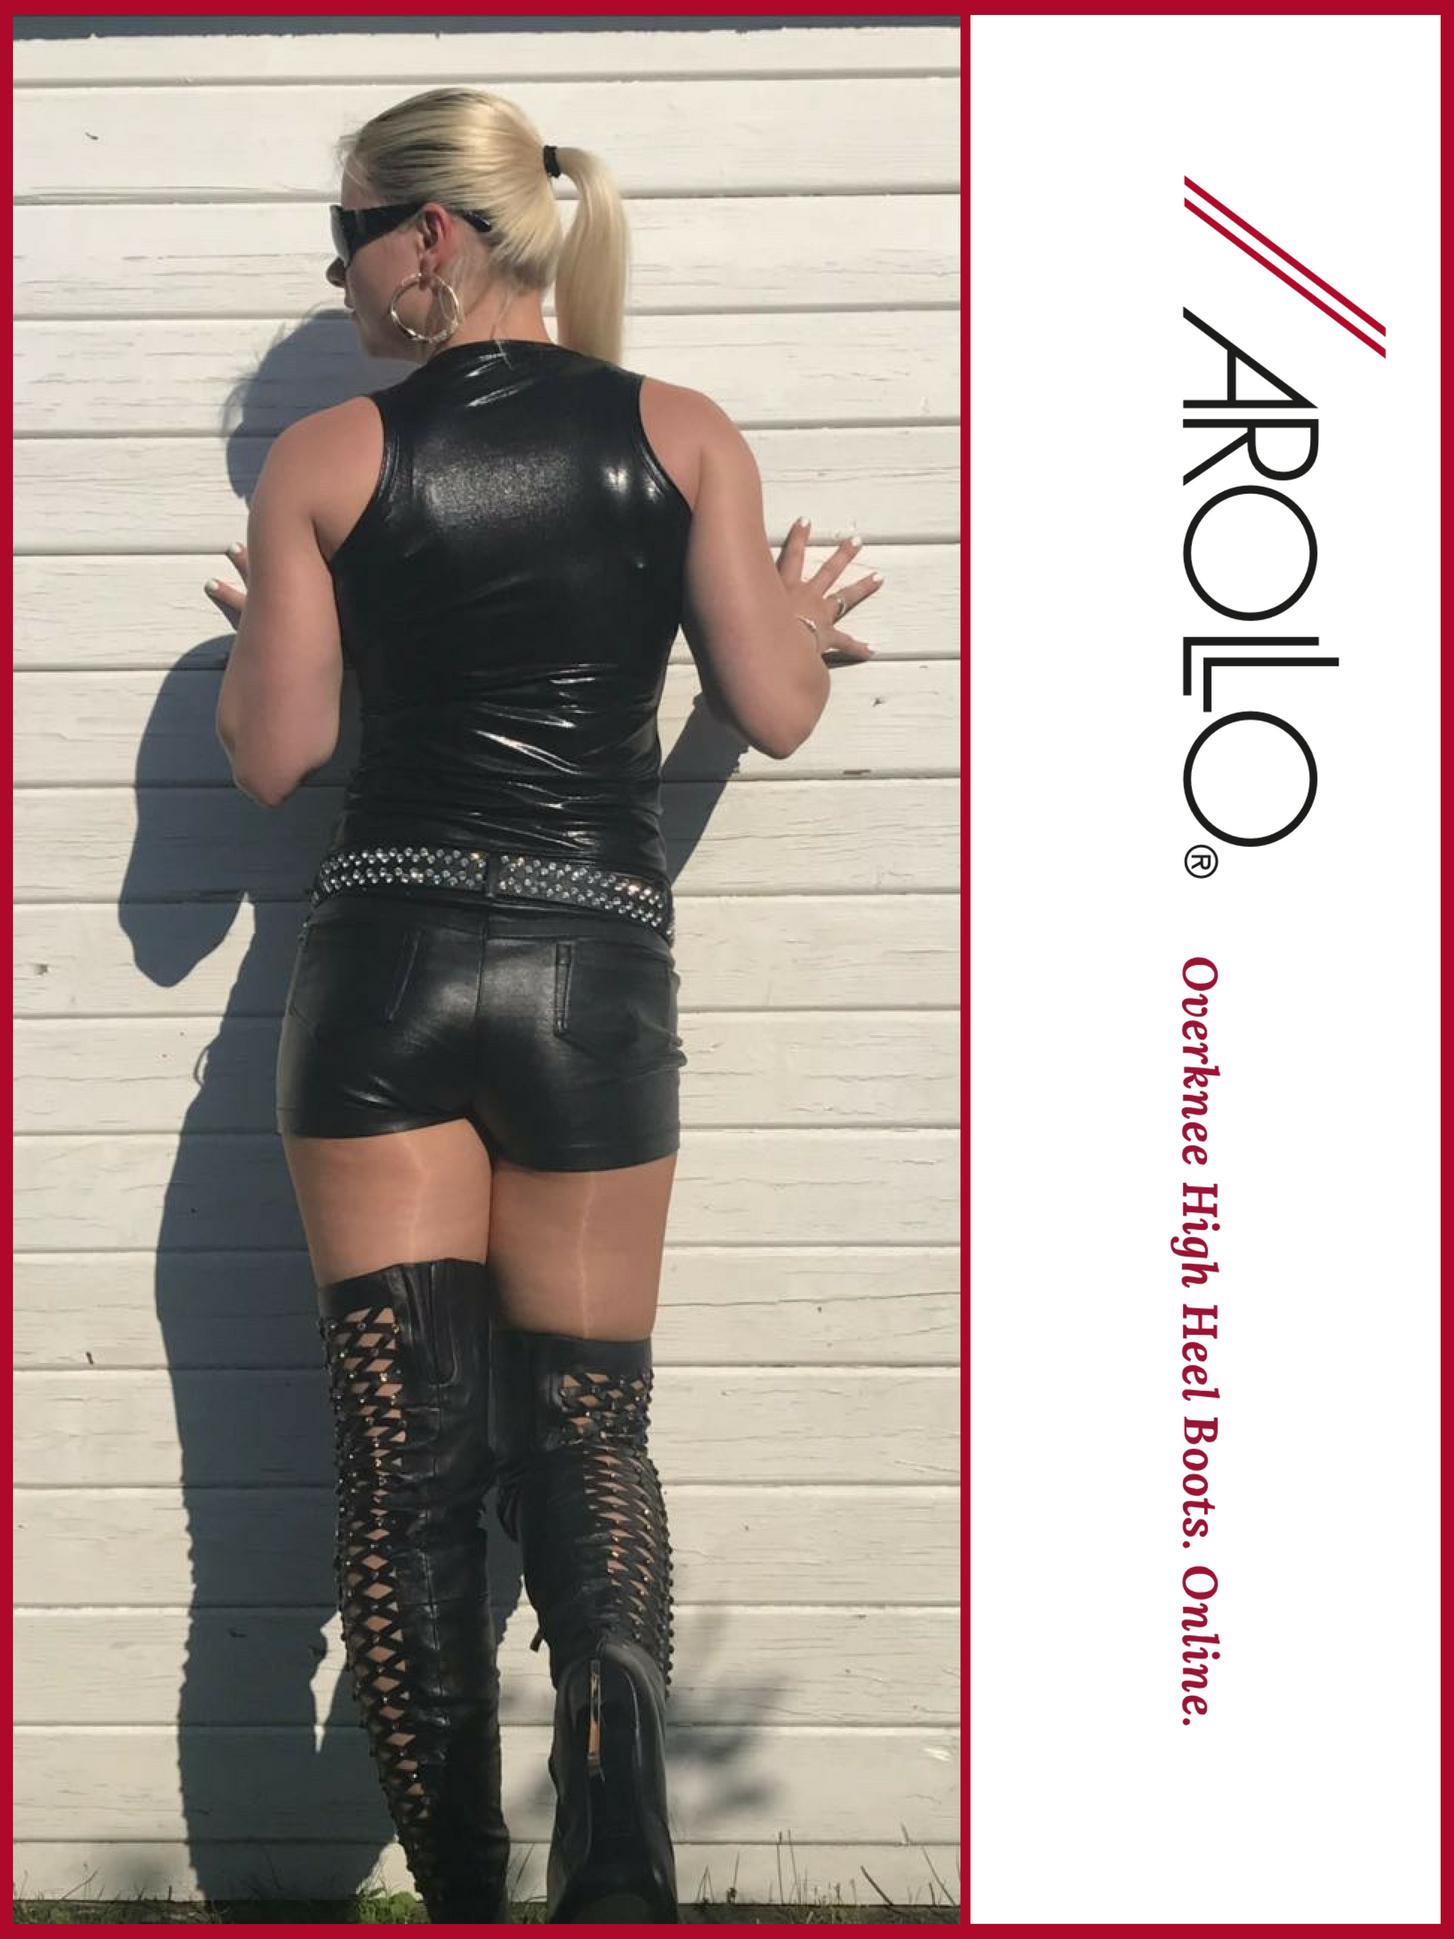 AROLLO Thigh High Boots Lady Vanessa I